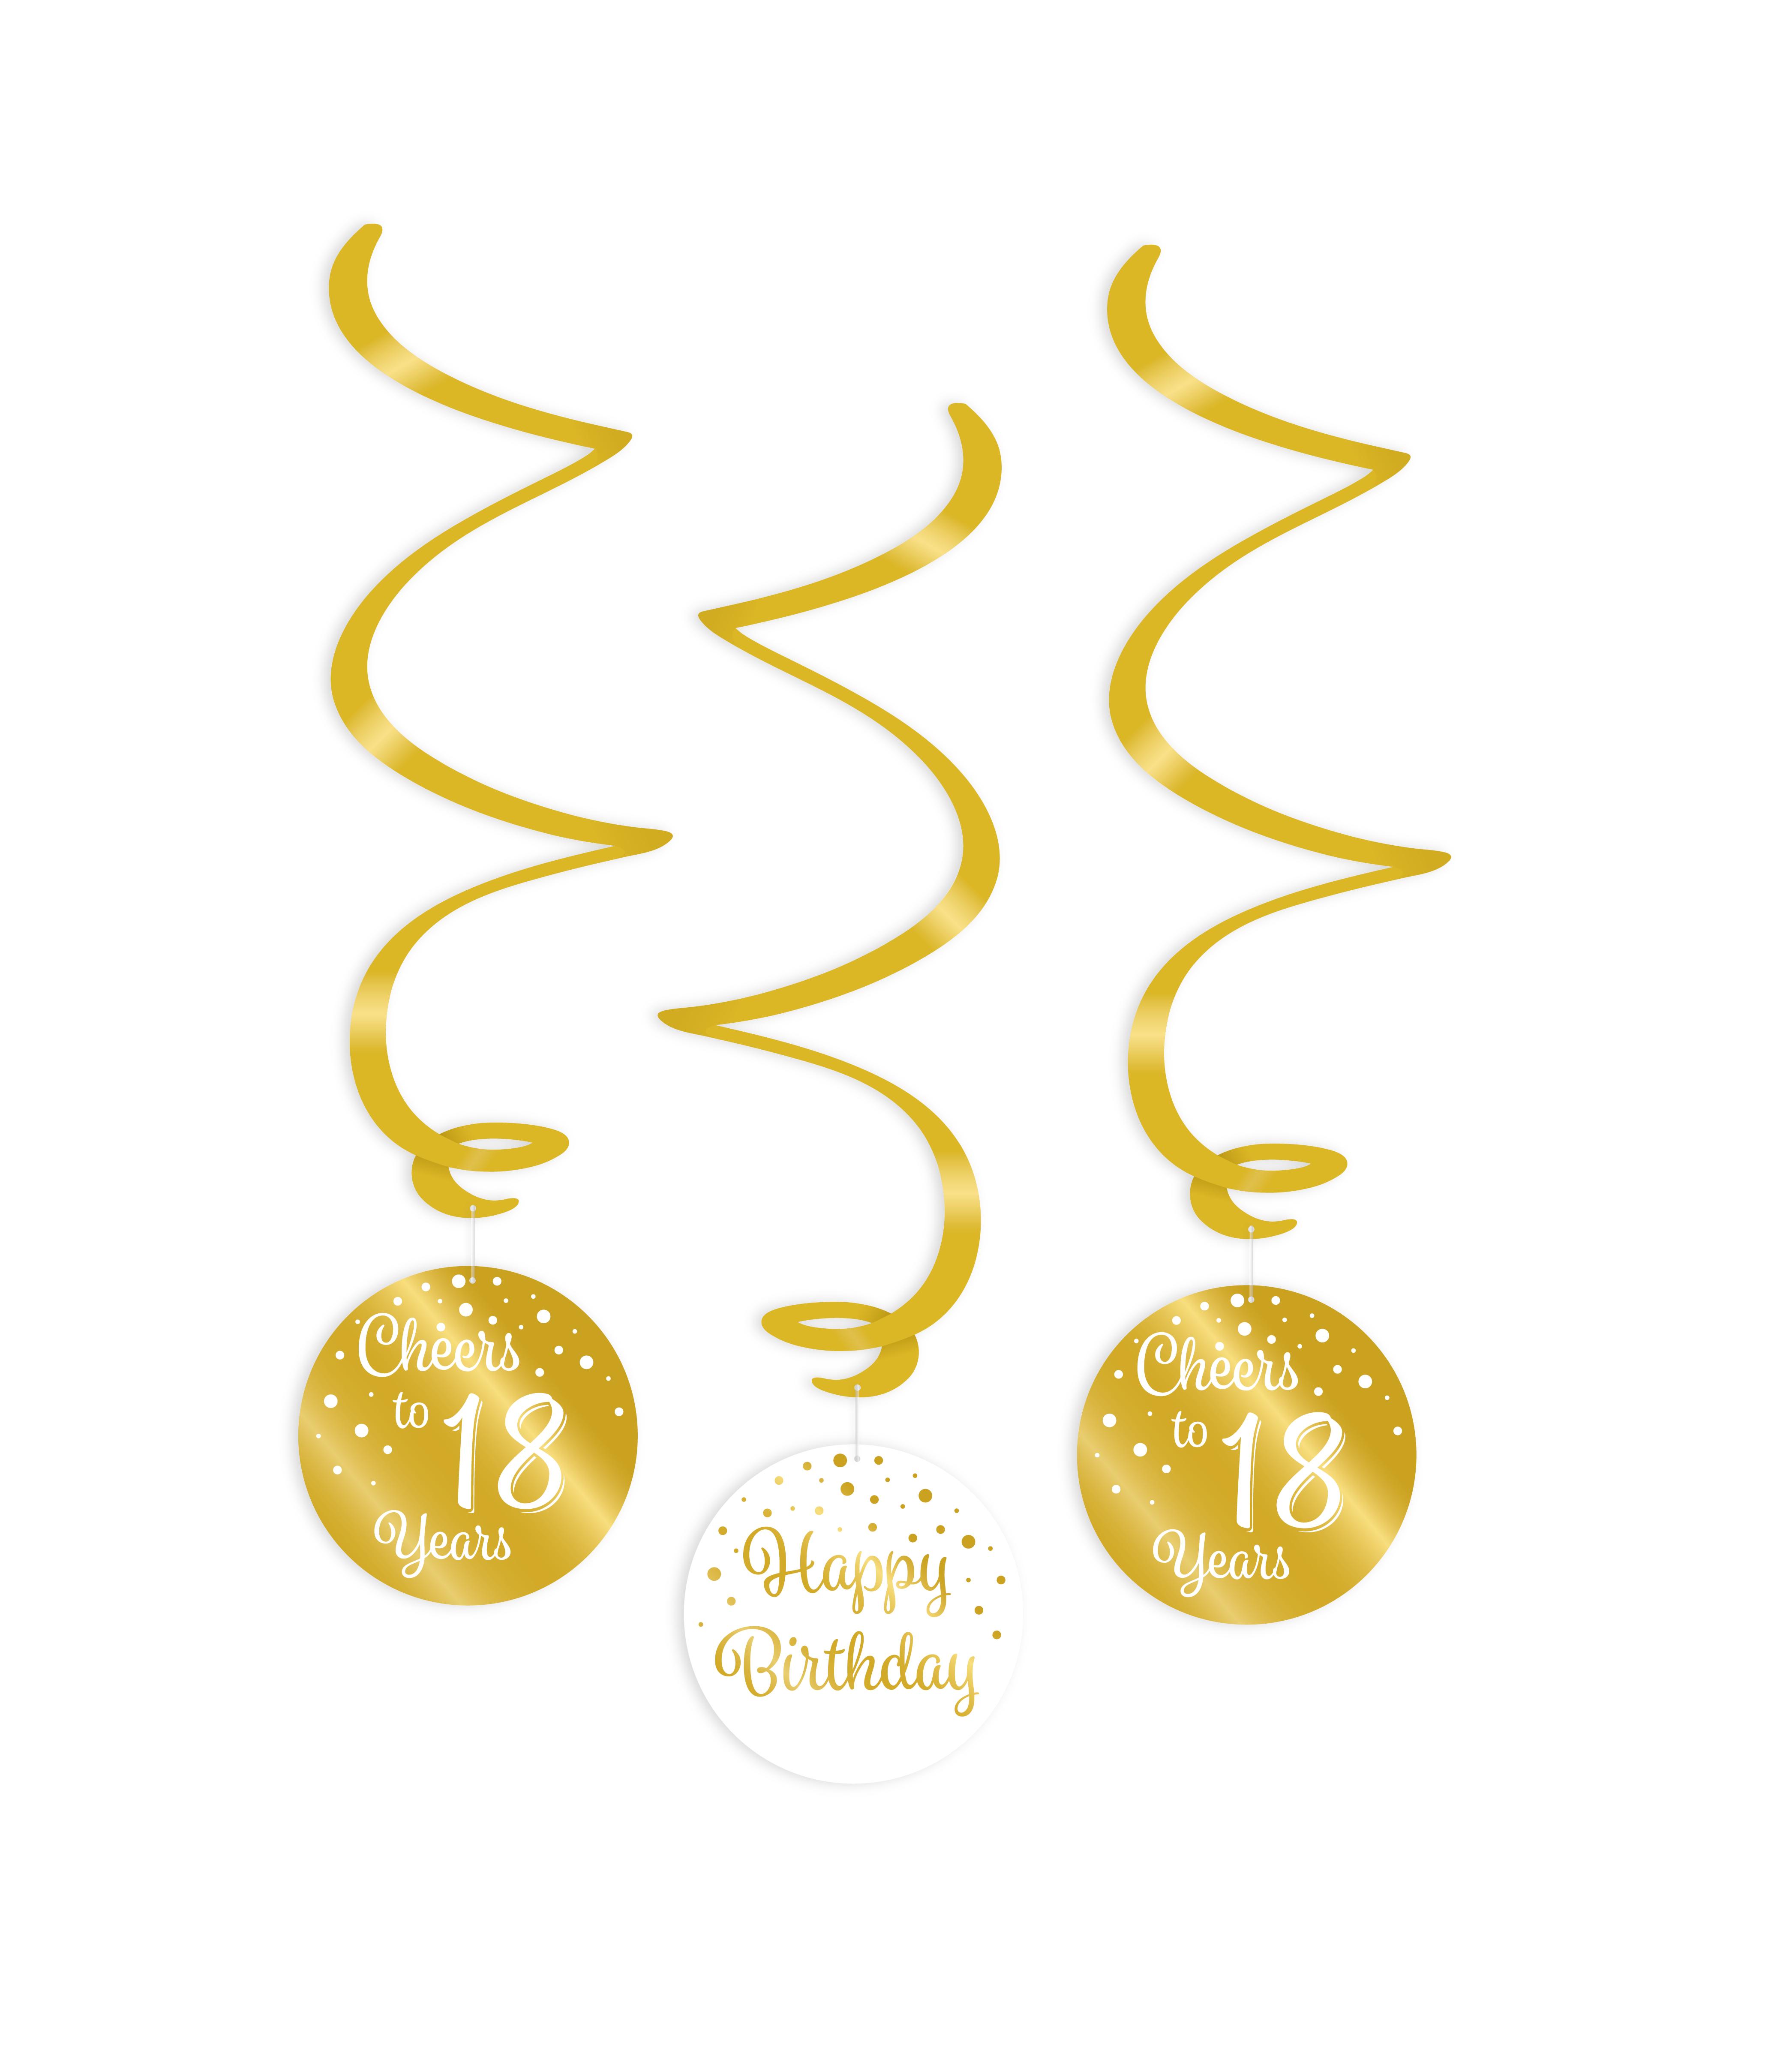 3st Hangdecoratie Goud/Wit Cheers to 18 Years